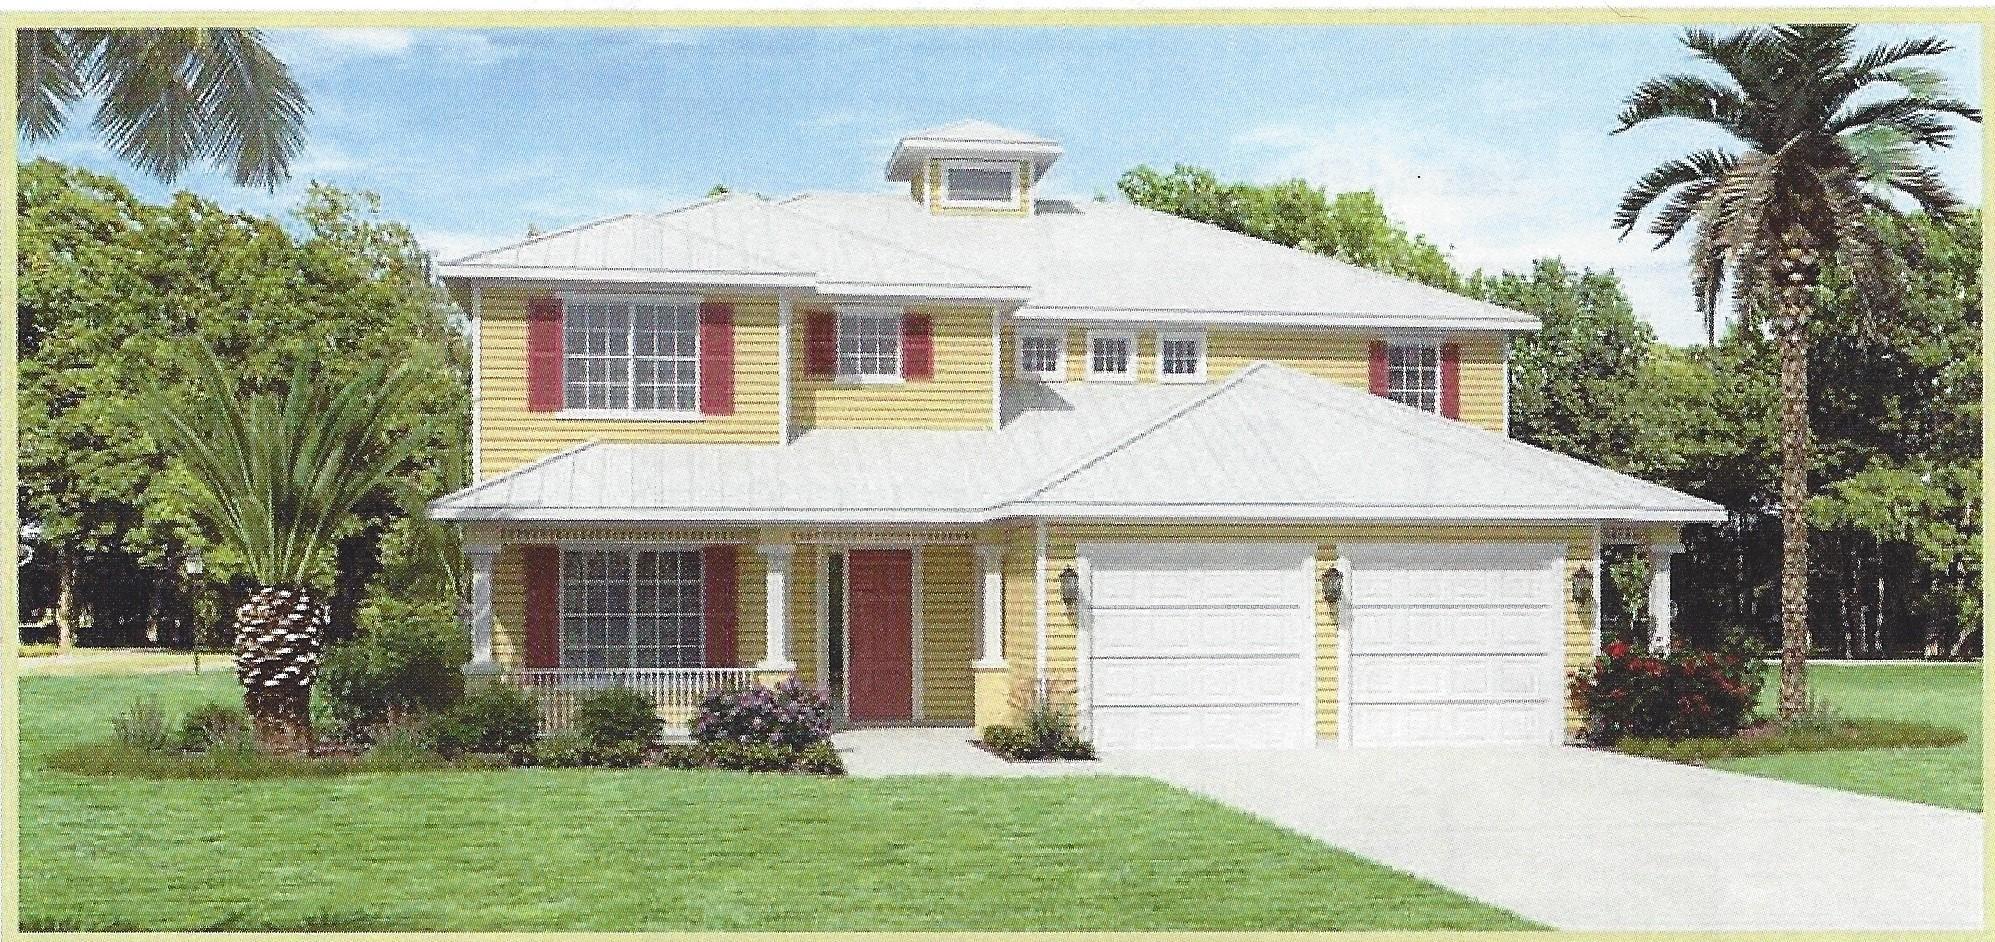 Photo of 701 NW Sunset Drive, Stuart, FL 34994